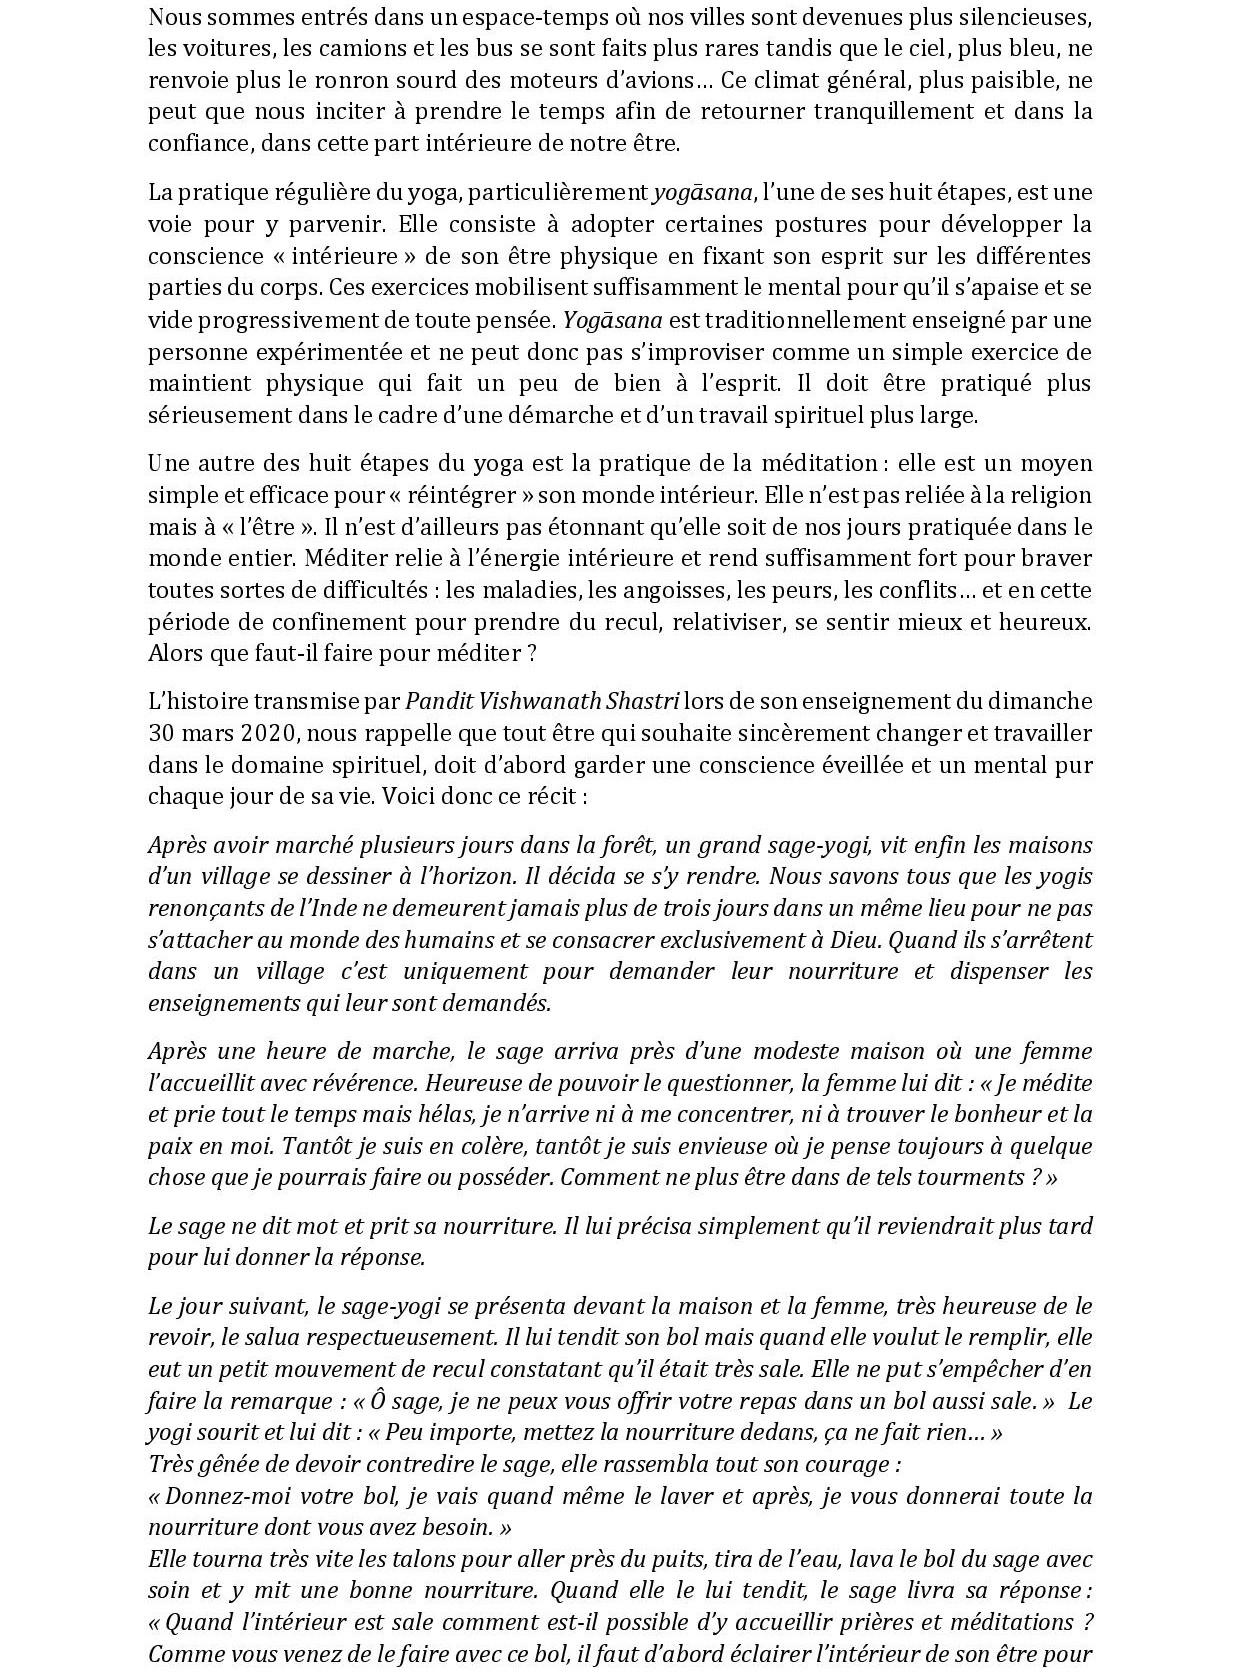 astrologie indienne et coronavirus(1)-page-002